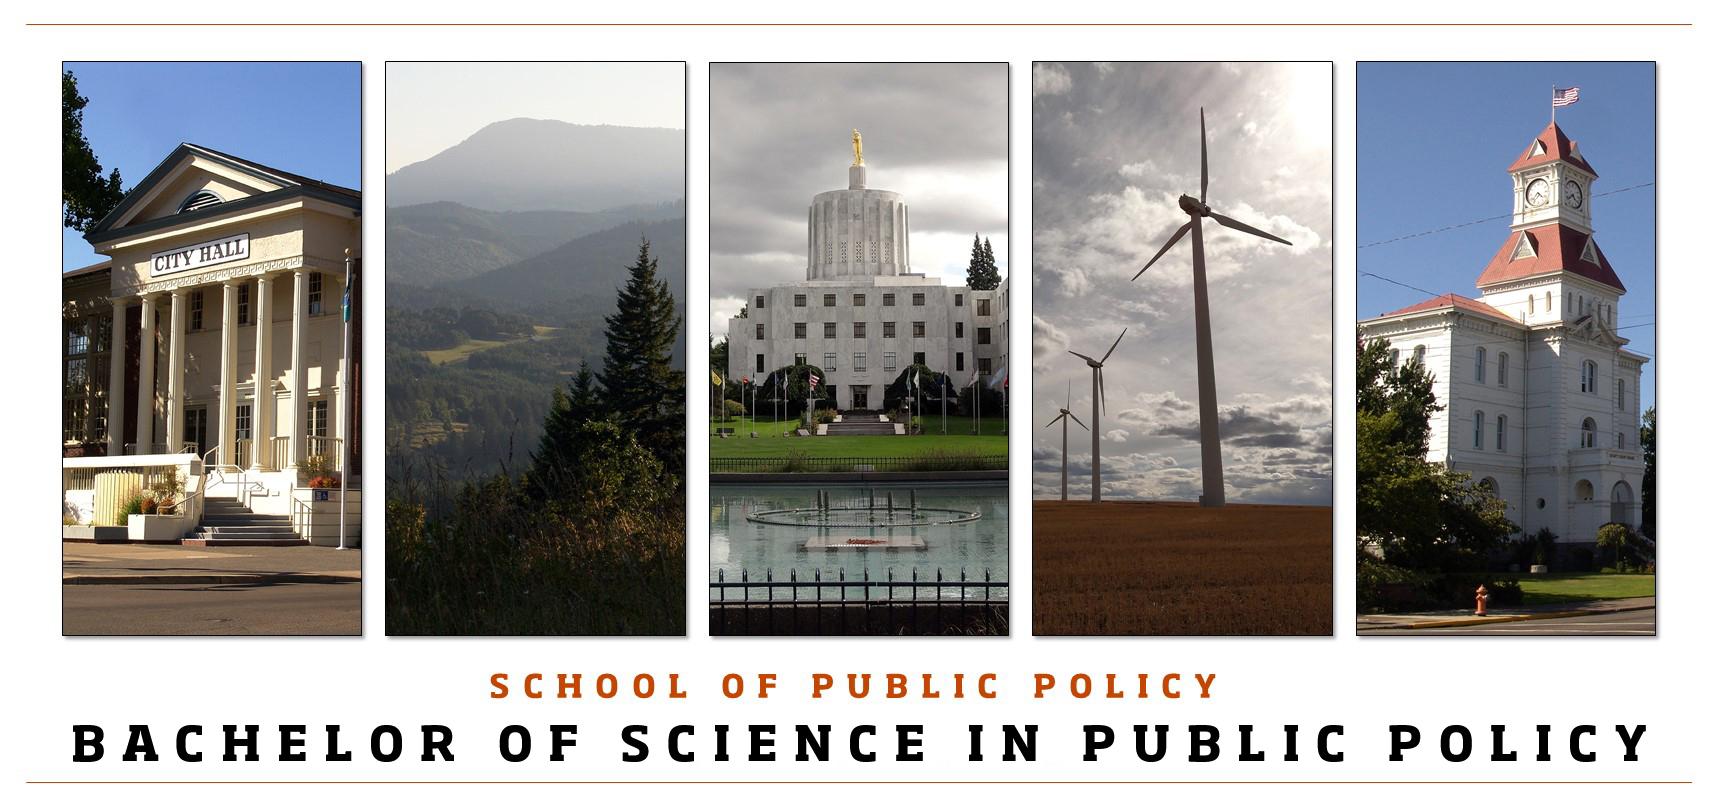 Public policy scenes from around Oregon